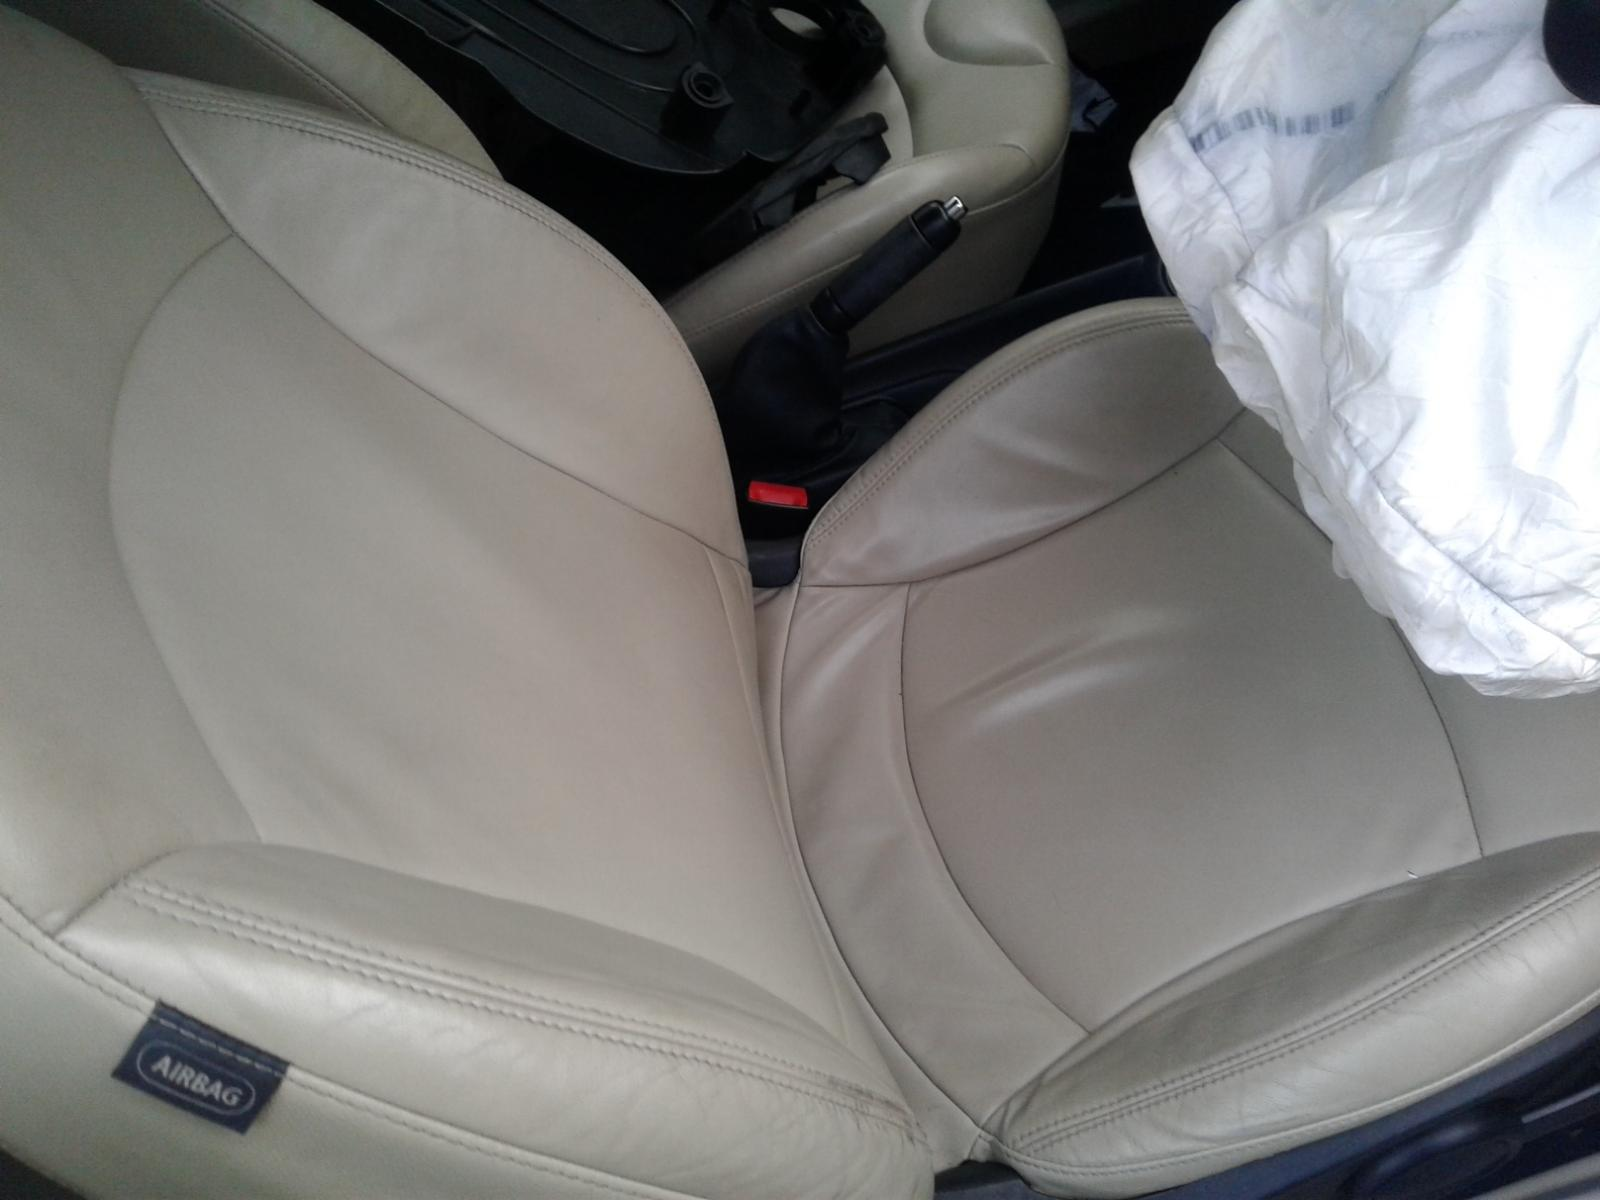 View Auto part MINI (BMW) MINI 2011 2 Door Unknown